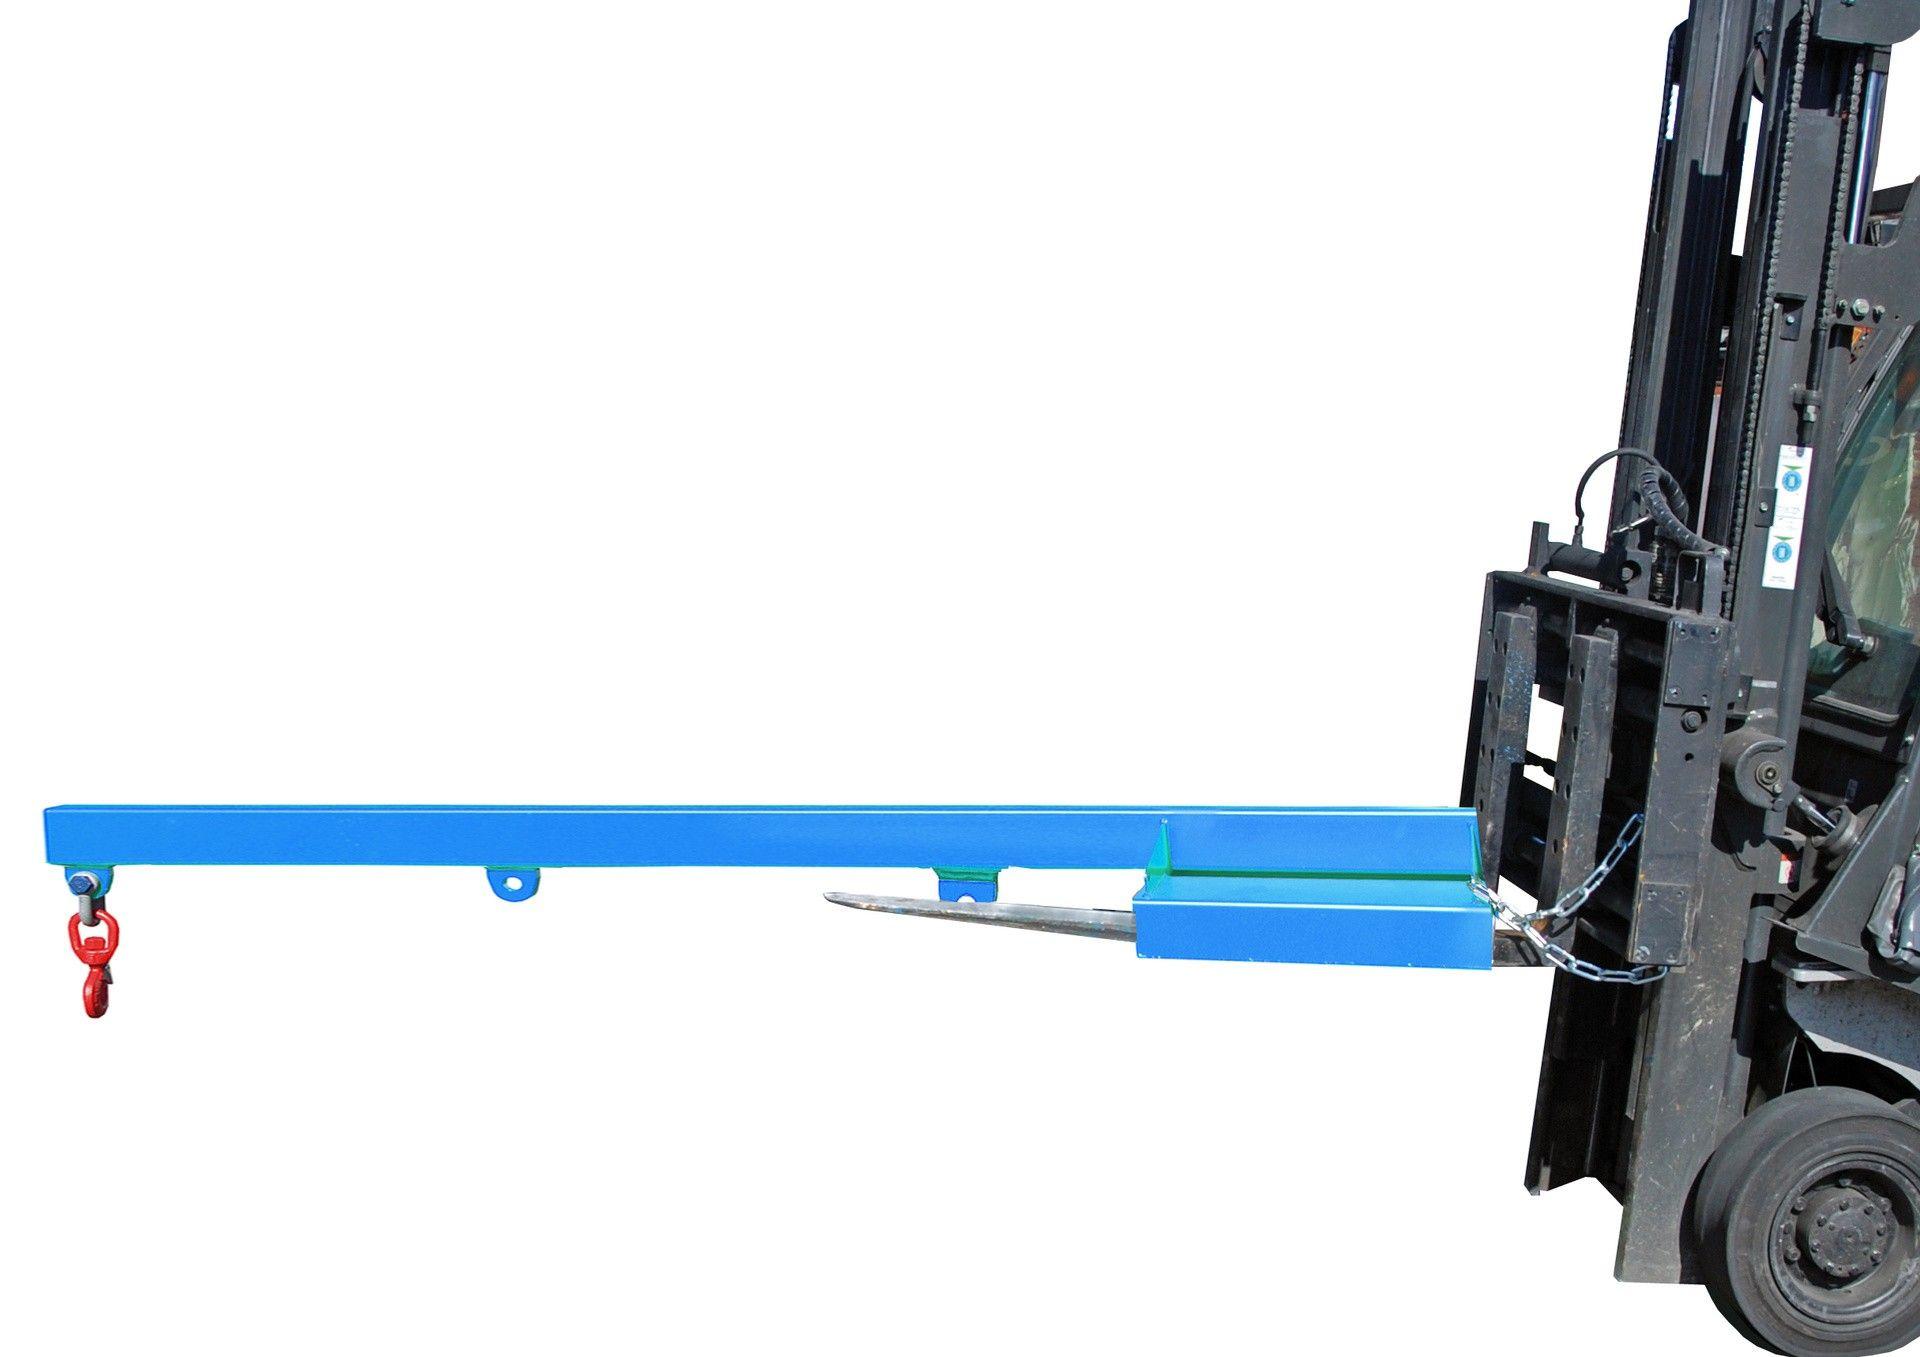 Lastarm Fur Stapler La 2400 2 5 Tk 2500kg Lackiert Ral 5012 Gtardo De Ral Lackieren Stahlkonstruktion